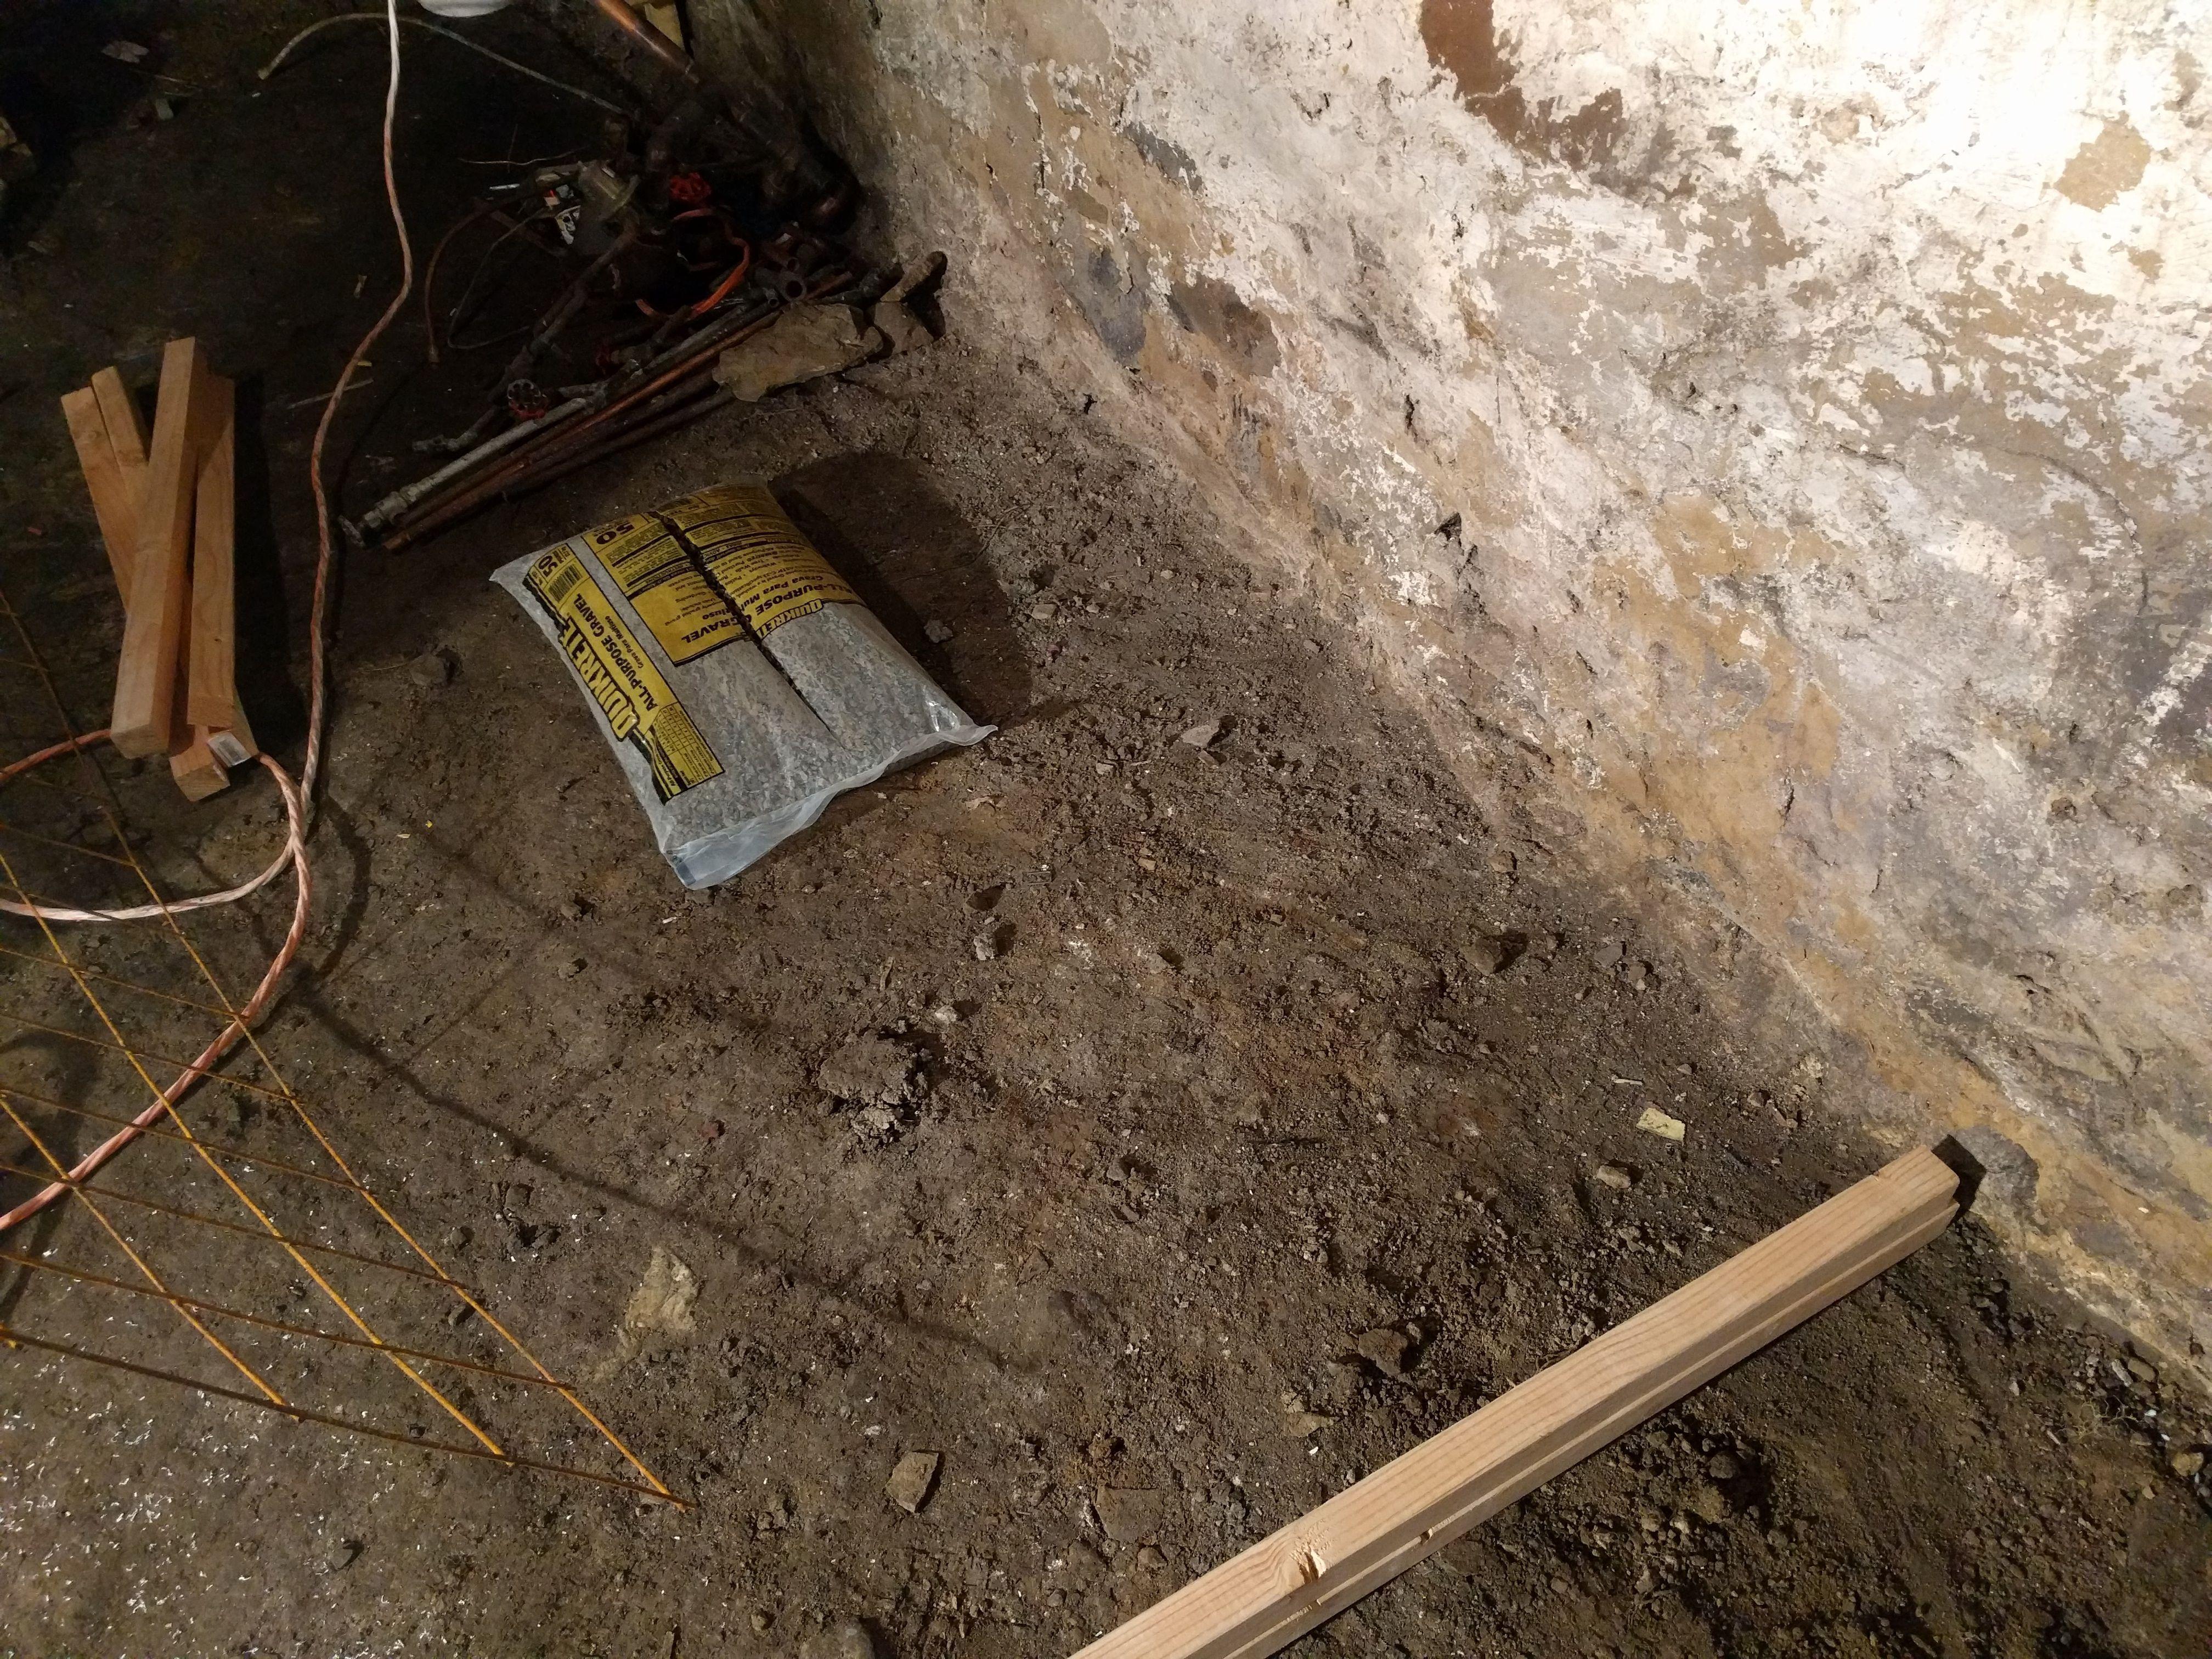 Pour Concrete Over Dirt Basement Floor Basementfloorideas Electrical Wiring Ideas